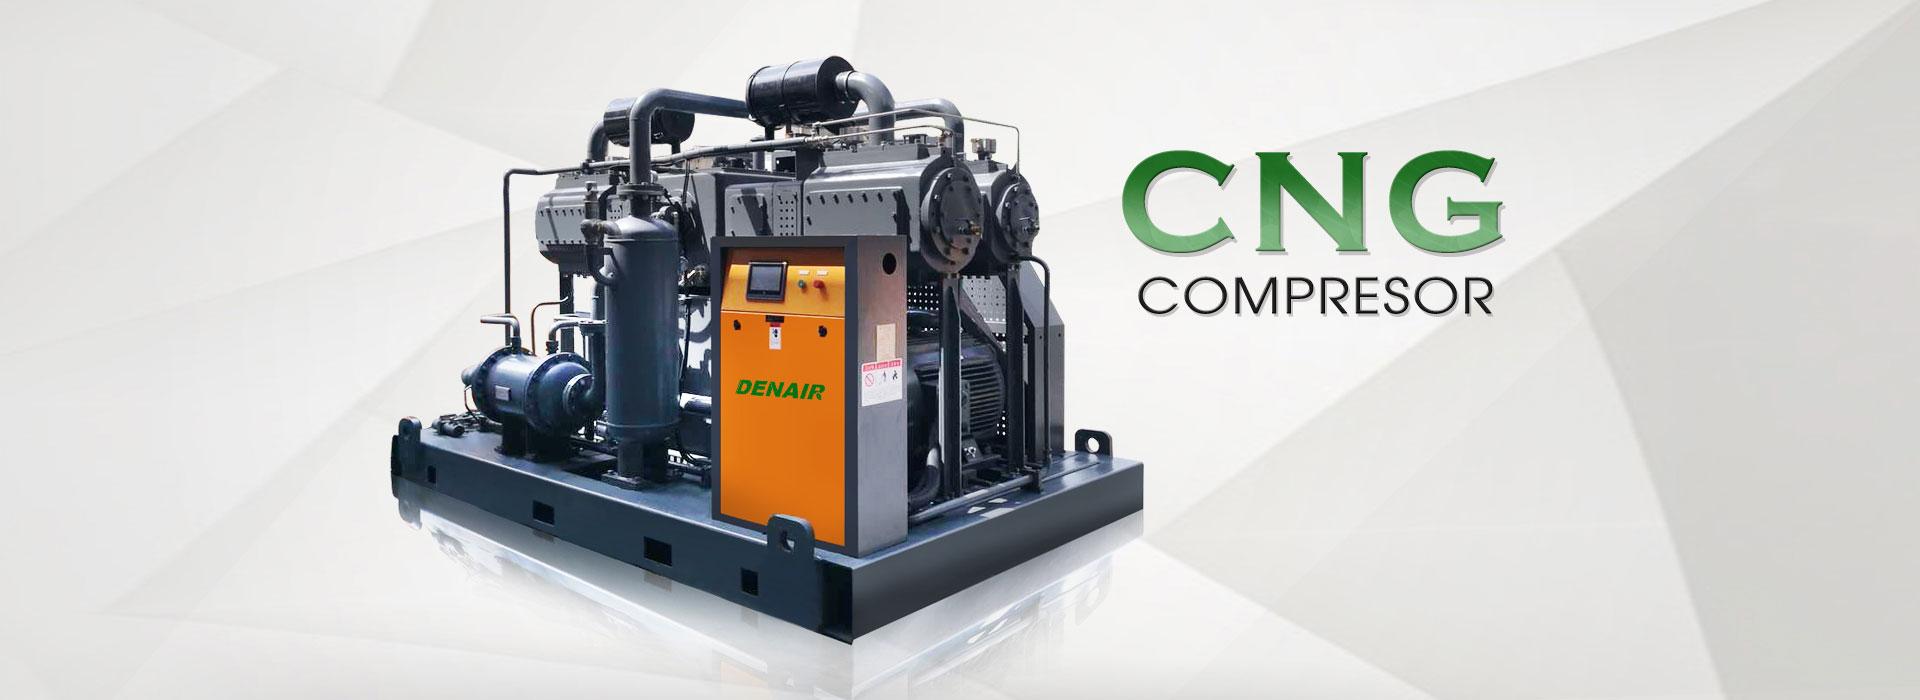 CNG Compresor